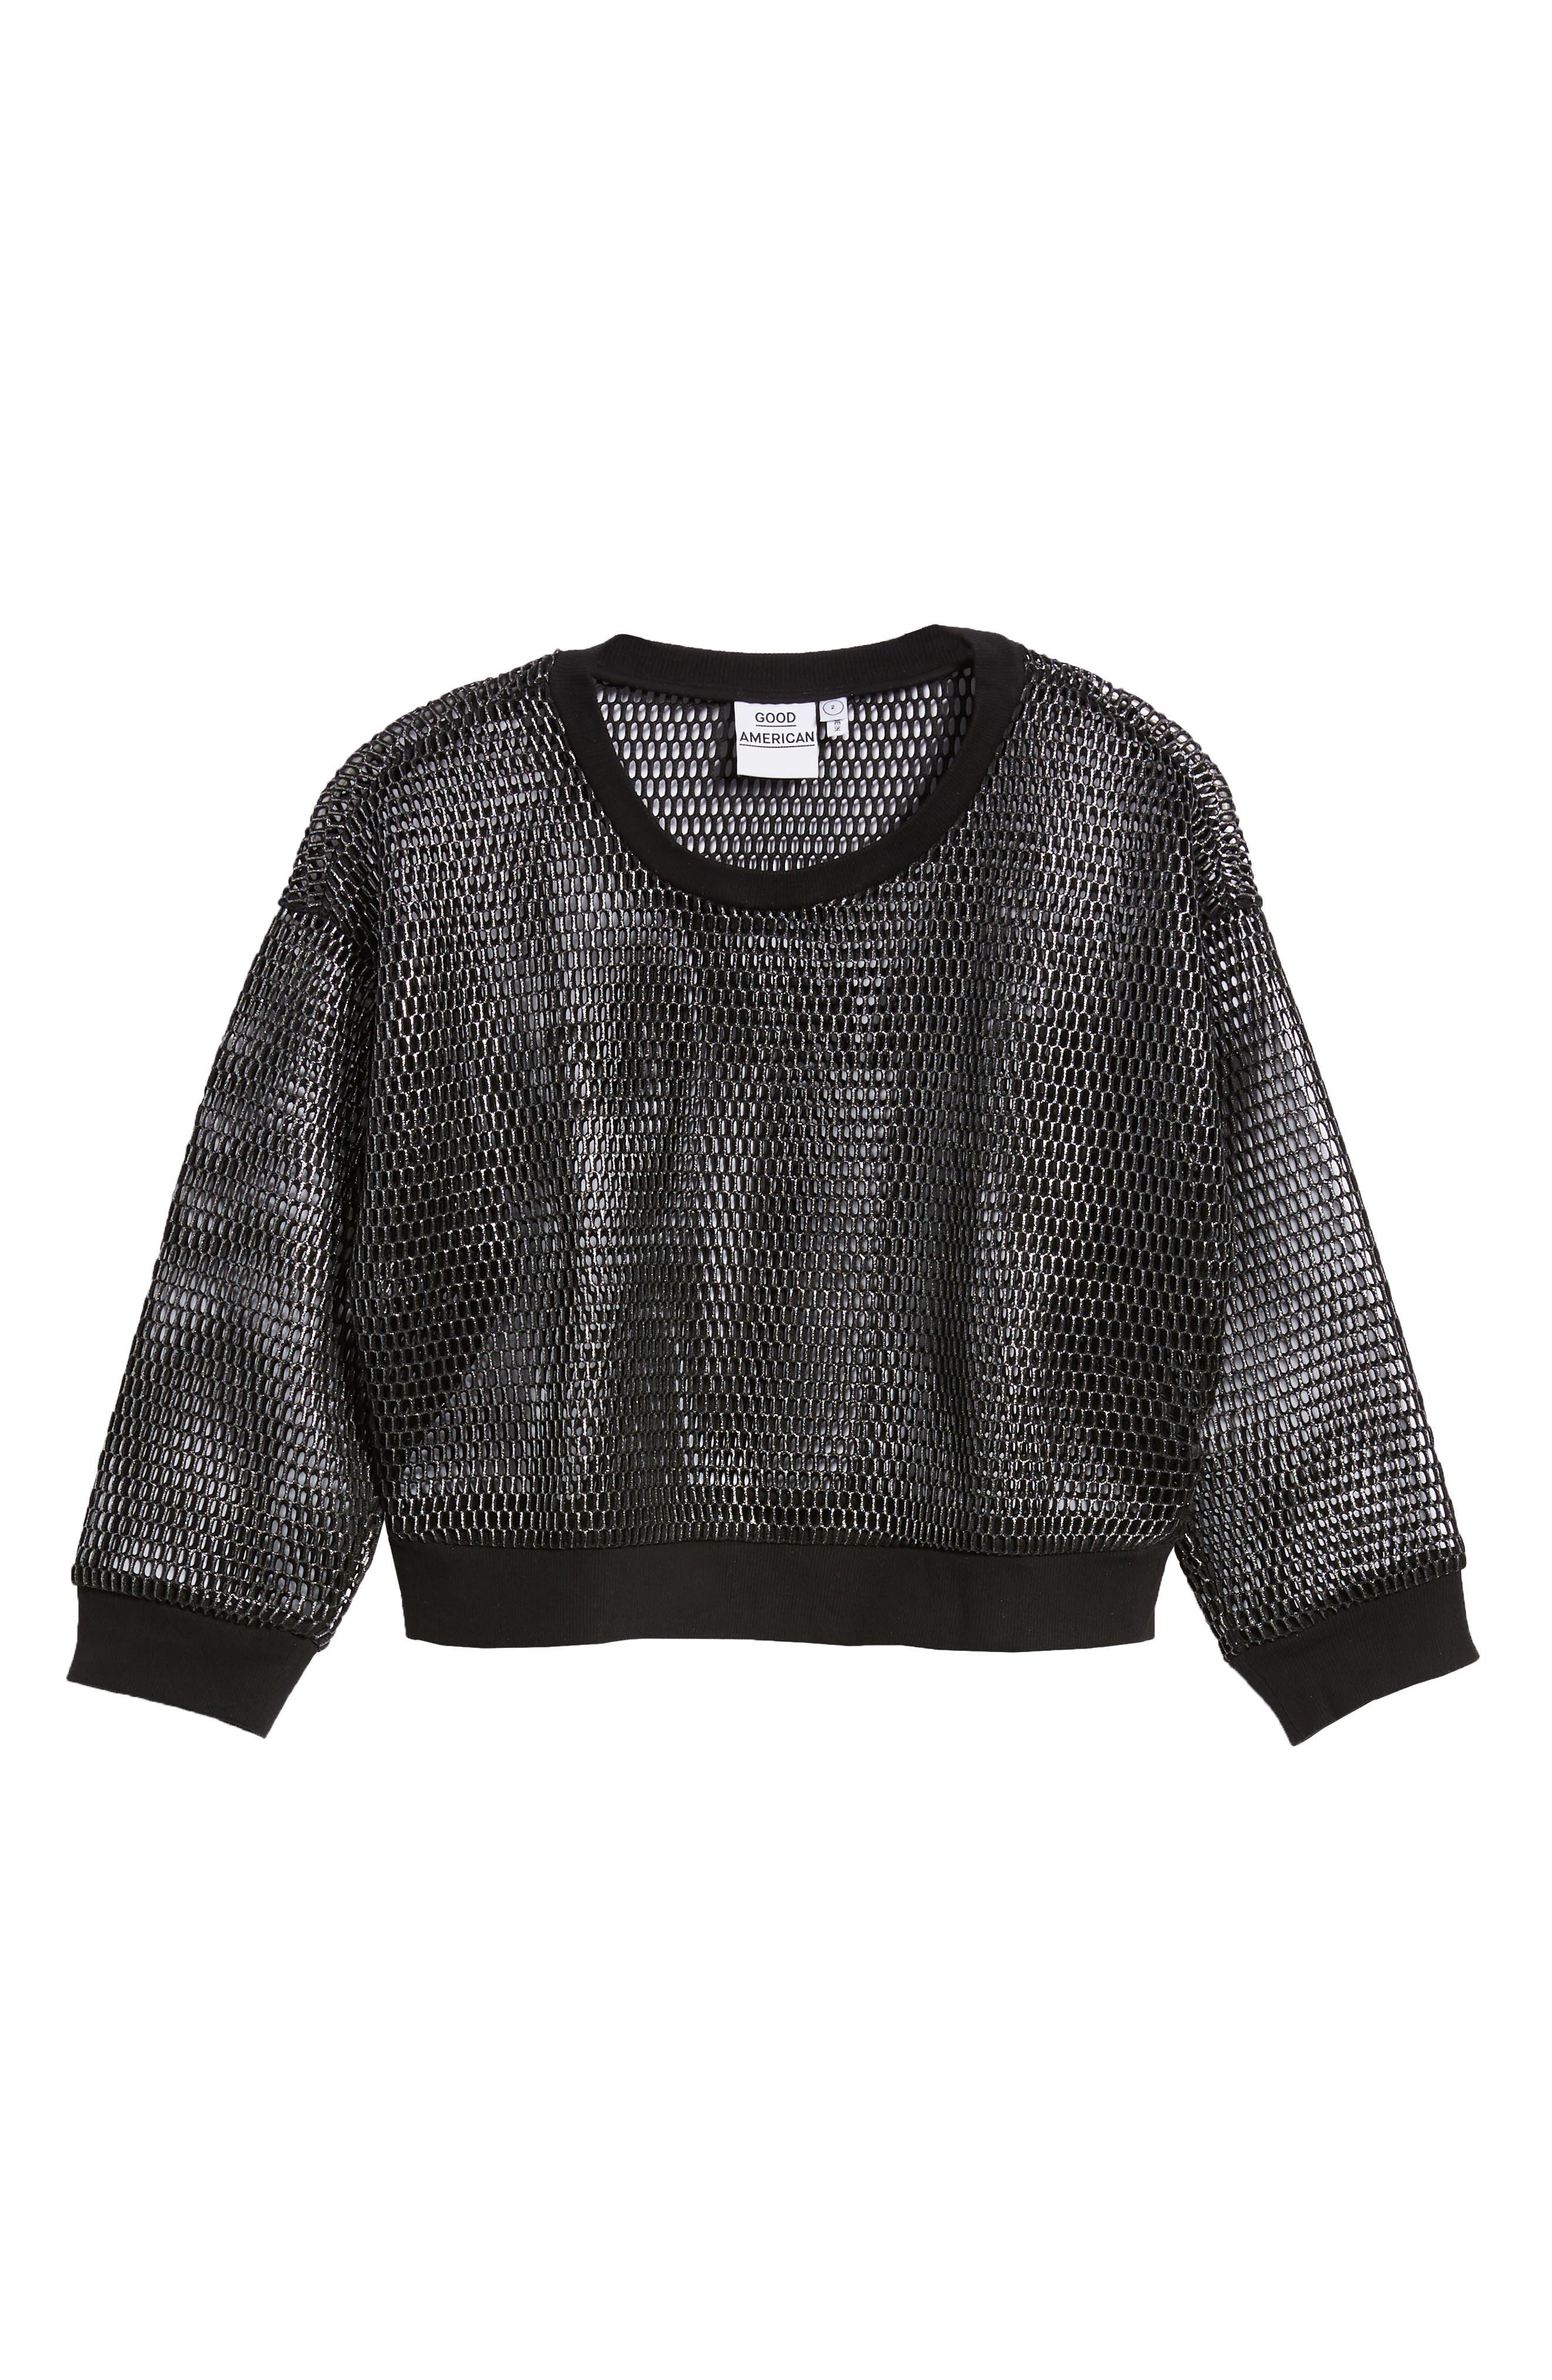 Branded Mesh Pullover Sweatshirt,                             Alternate thumbnail 4, color,                             SILVER001